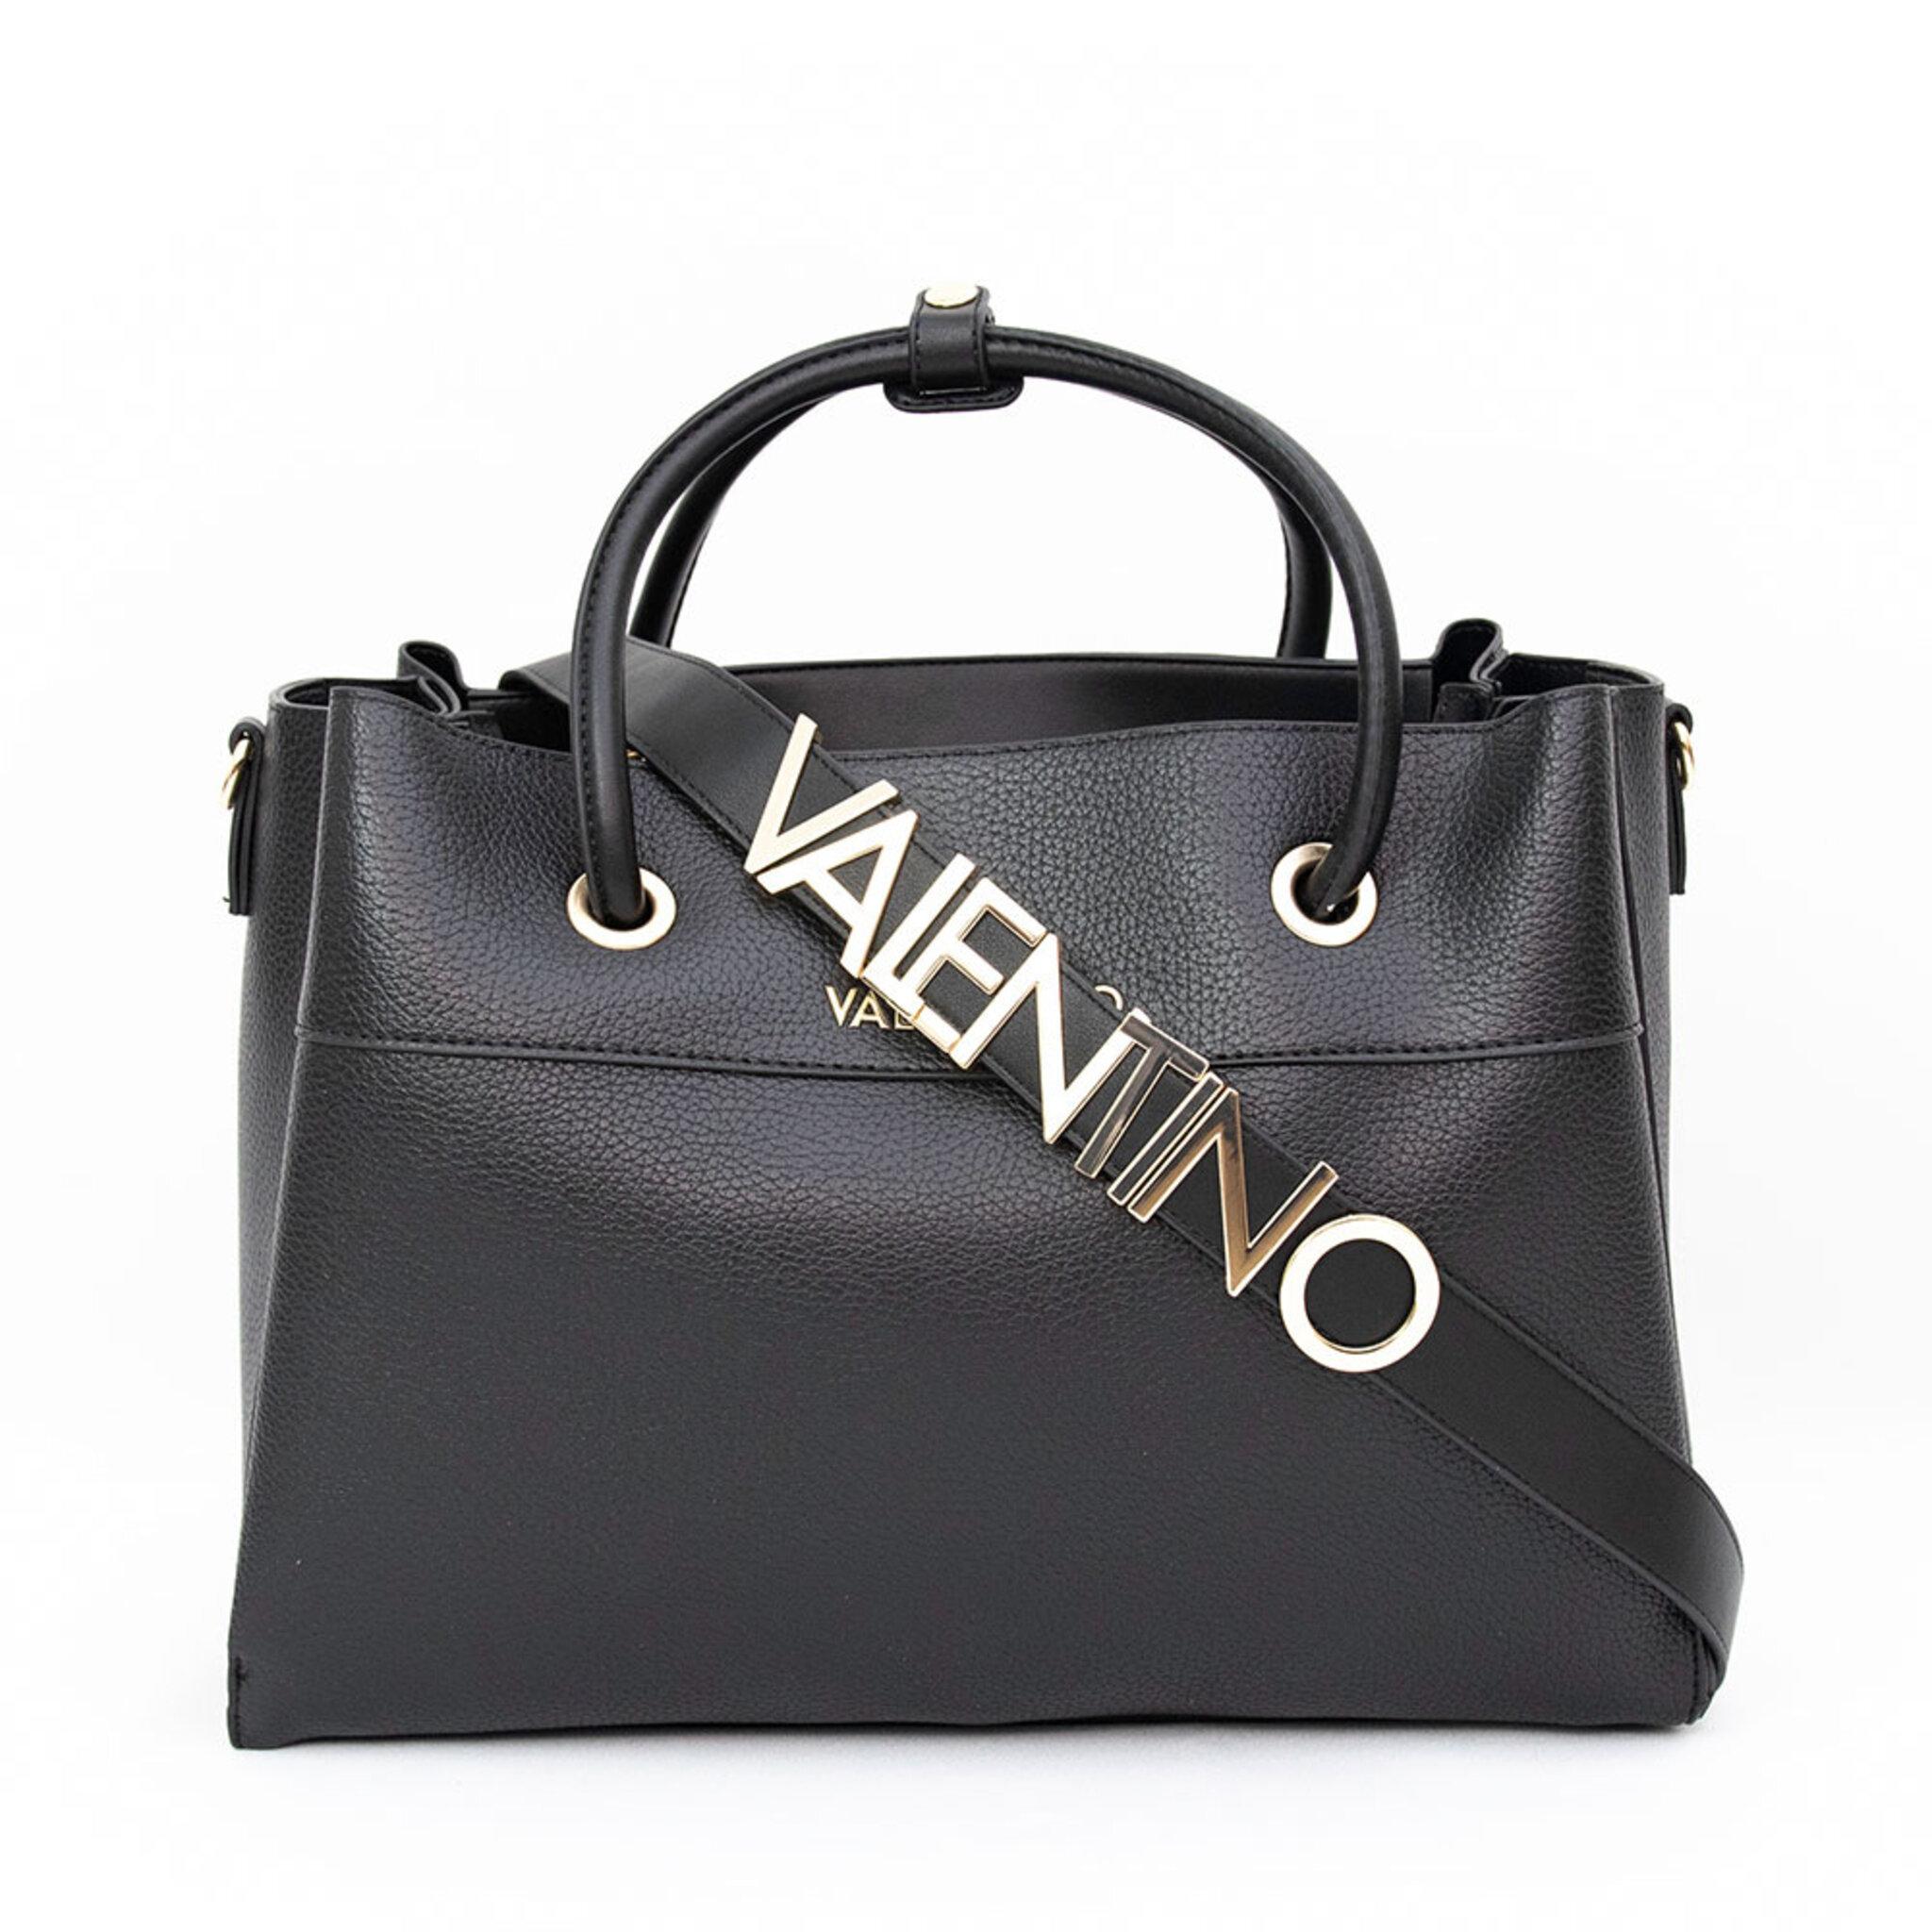 Handbag Alexia, ONE SIZE